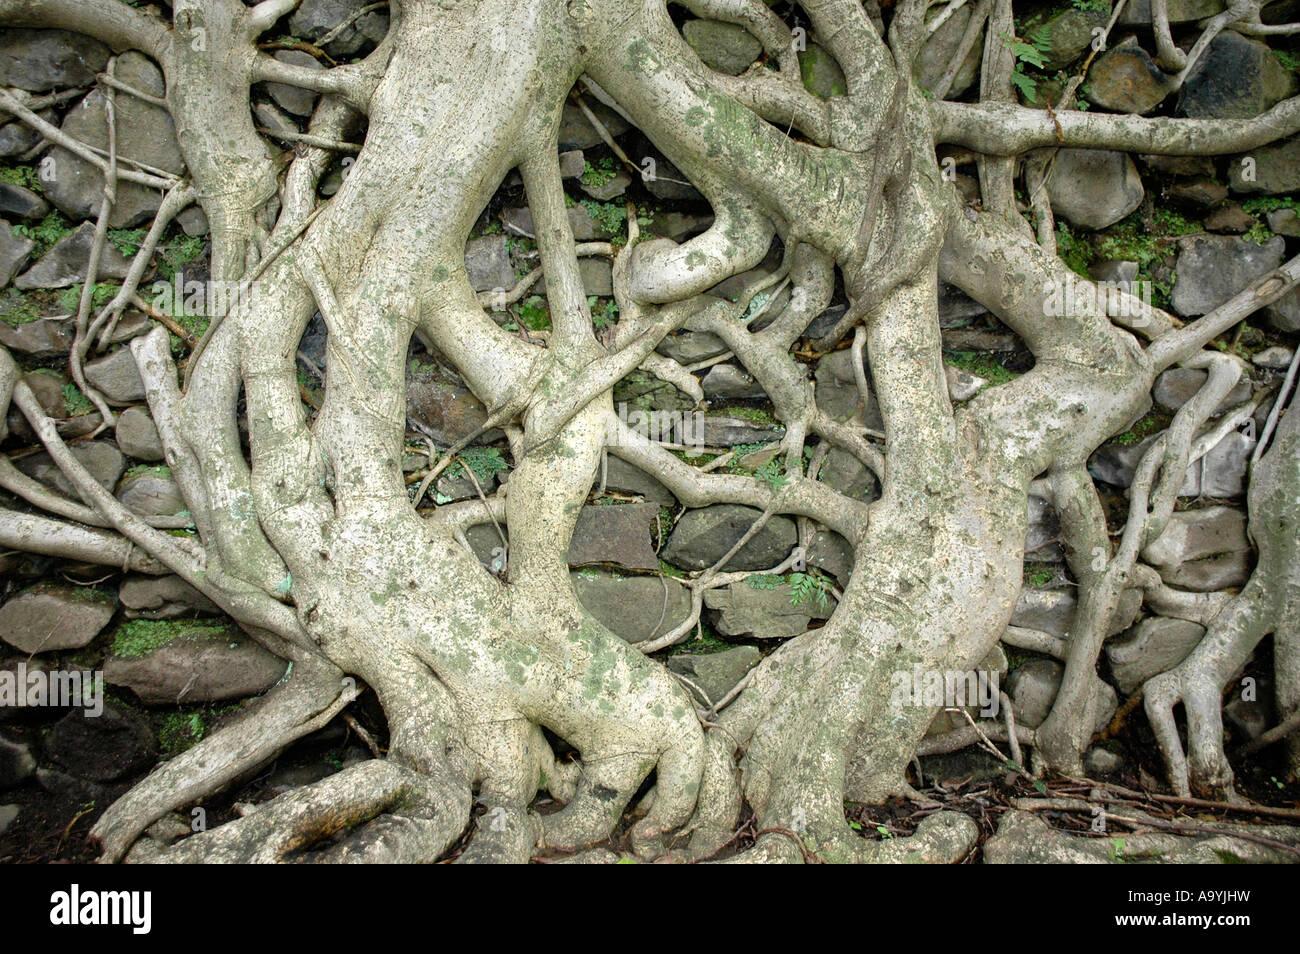 Roots of a tree at a wall Bath of Fasilidas Gondar Ethiopia Stock Photo